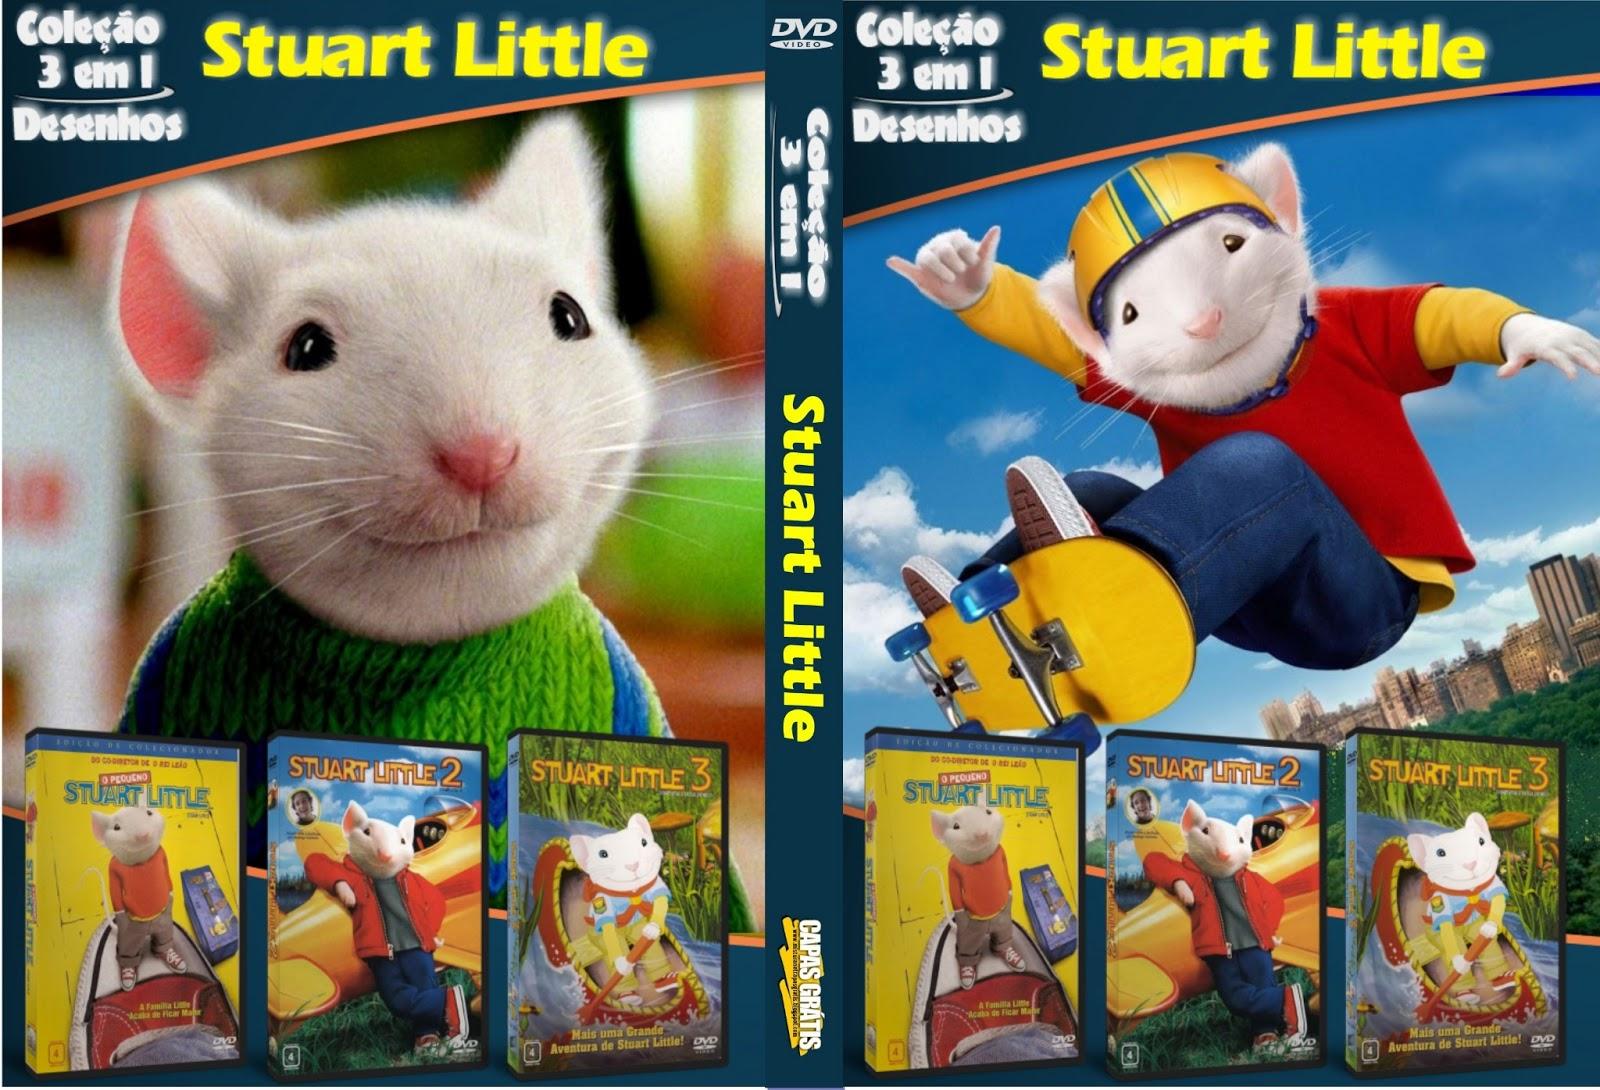 Stuart little 3 bigtits - d6